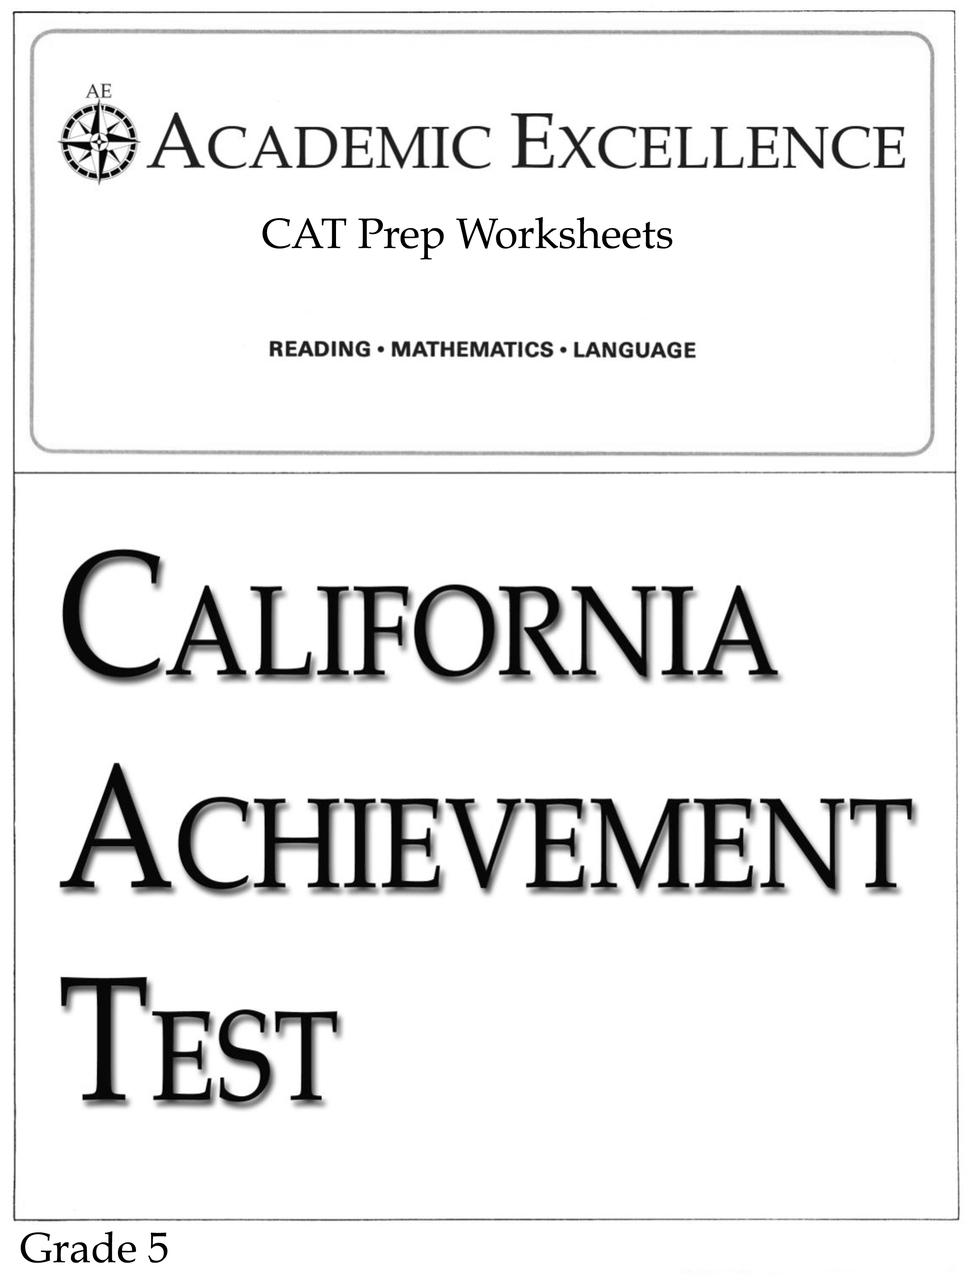 medium resolution of CAT Prep Pack: Grade 5 - PDF Download - Academic Excellence